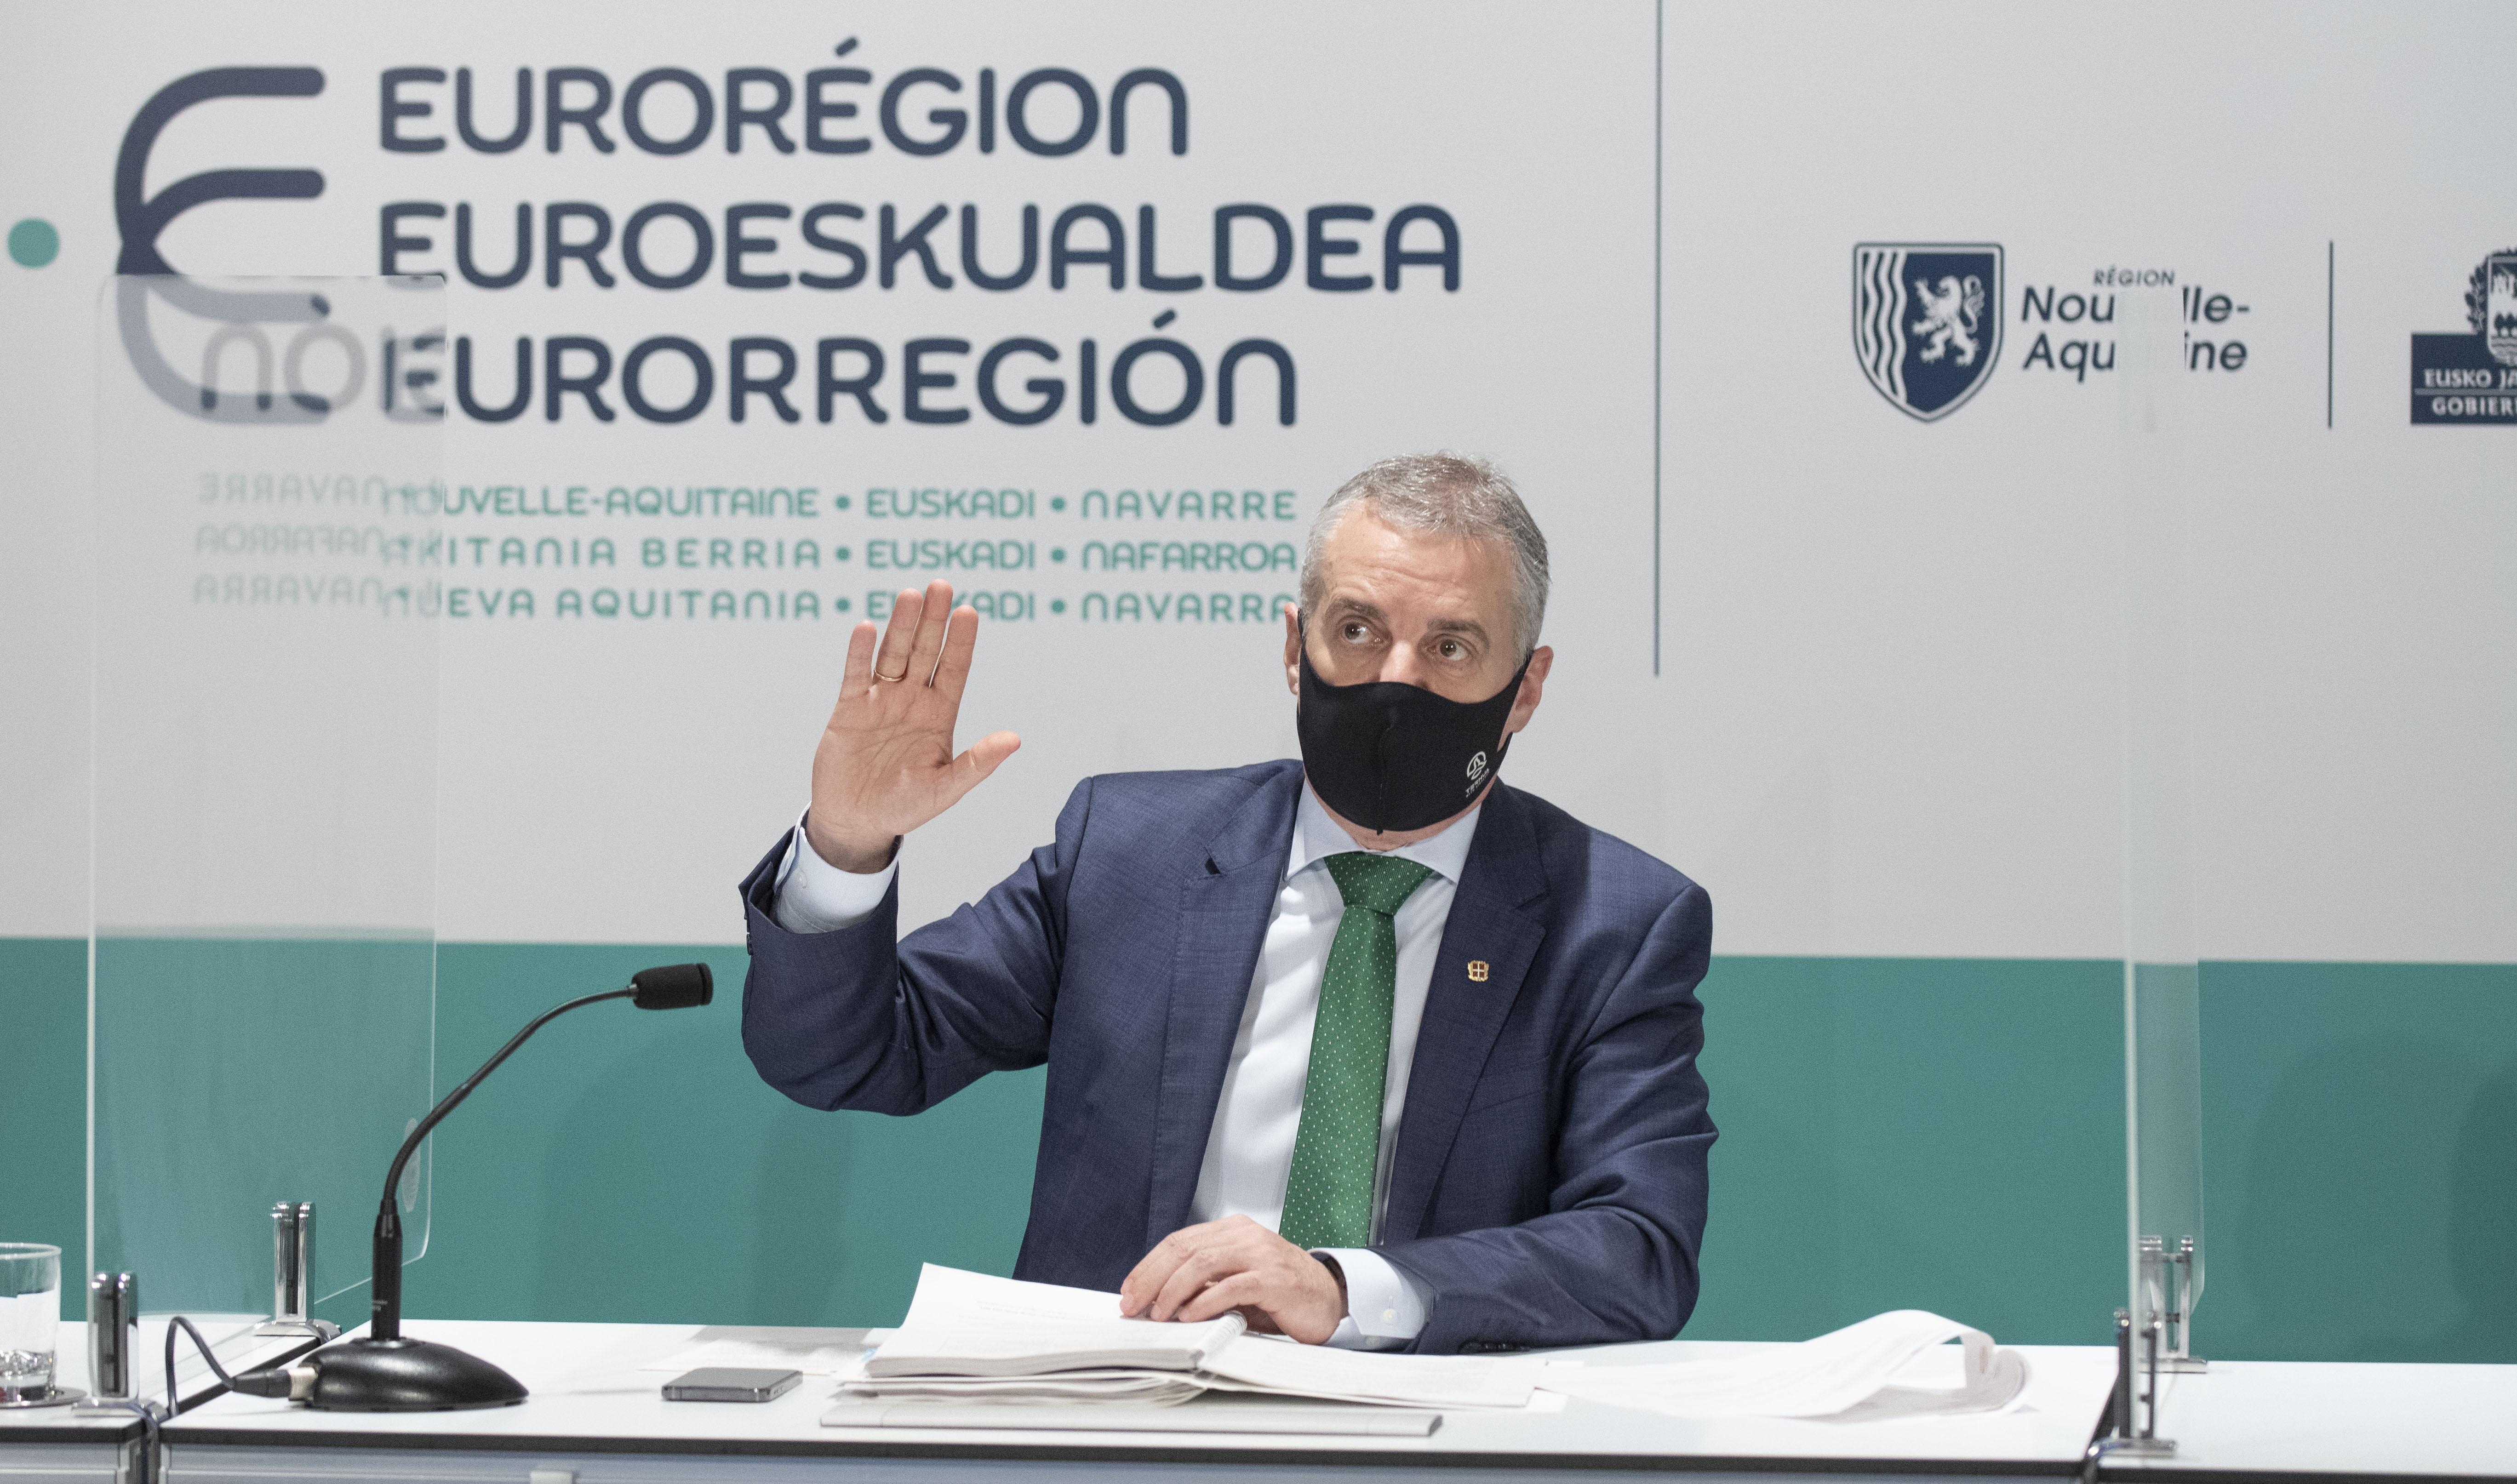 2021_03_16_lhk_eurorregion_03.jpg